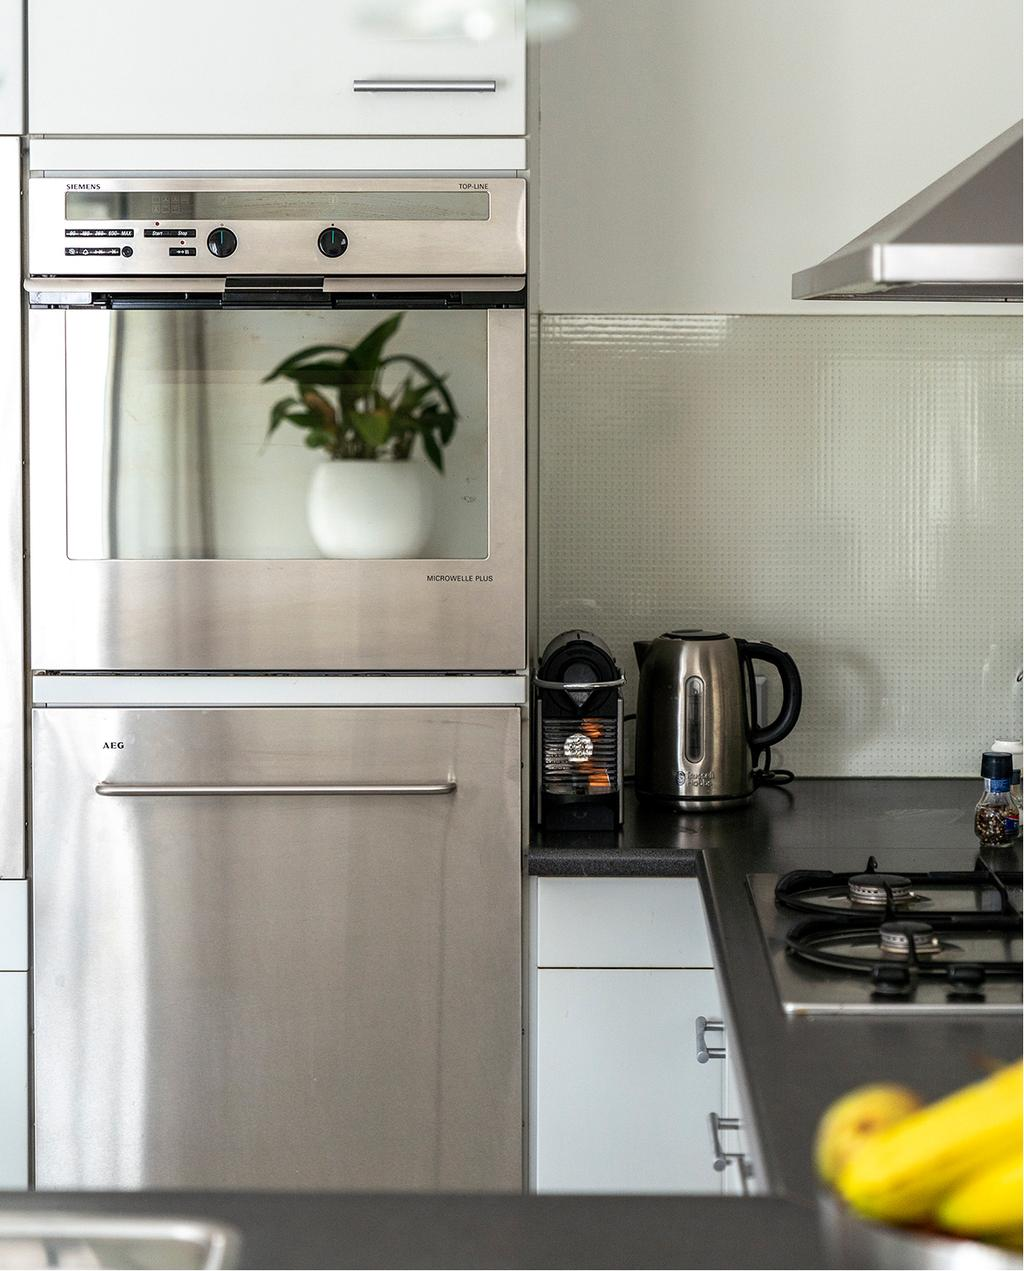 vtwonen 04-2020 | keuken groot en wit